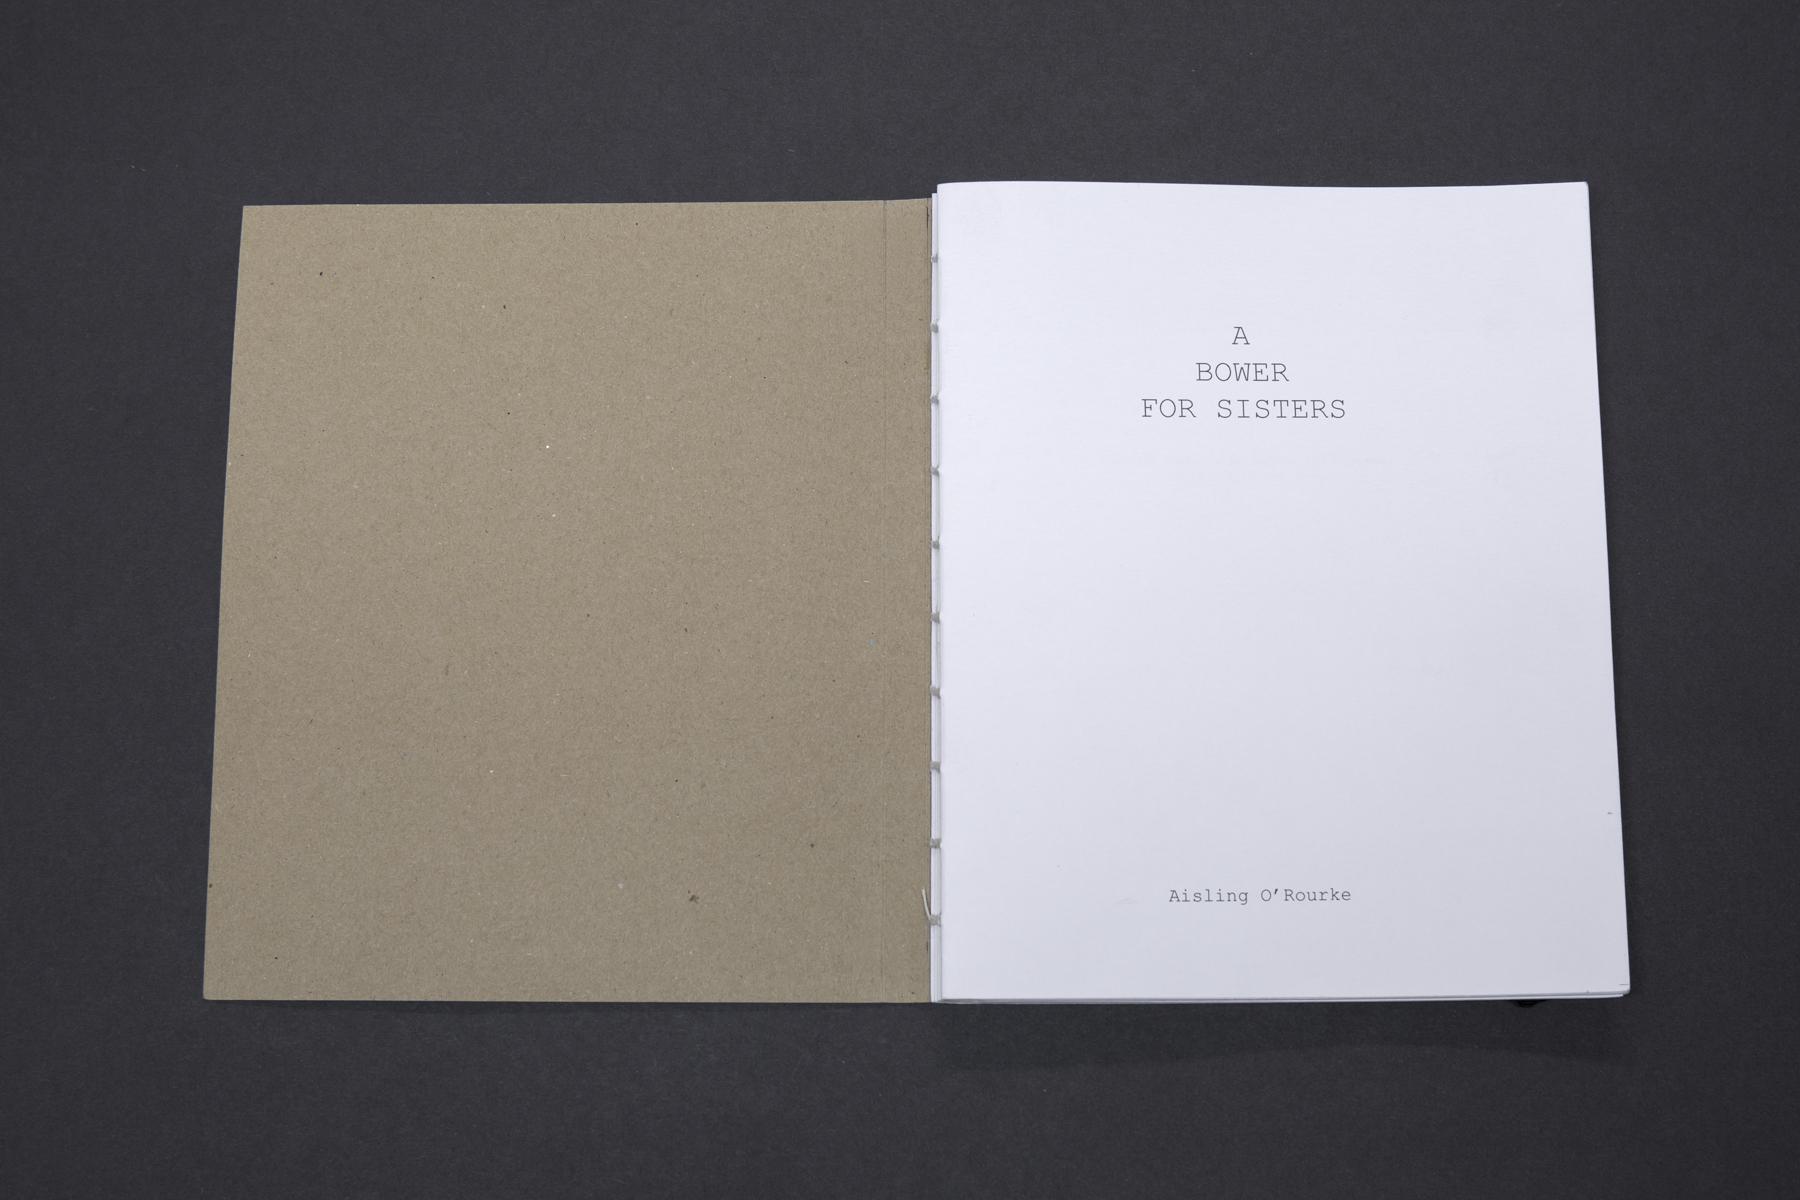 abowerforsisters-book-9.jpg